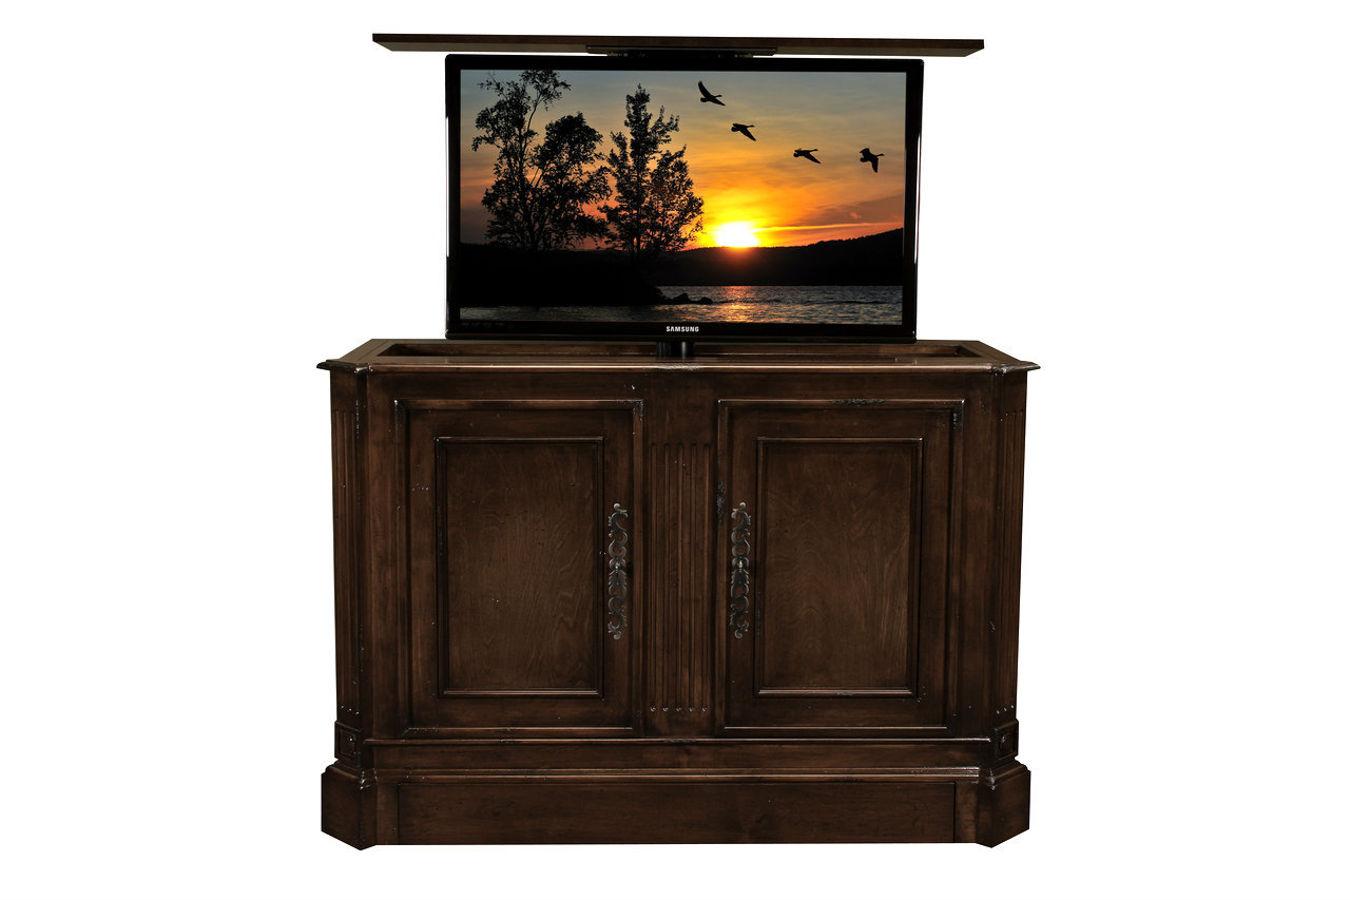 flat screen tv riser sierra tv lift cabinets. Black Bedroom Furniture Sets. Home Design Ideas